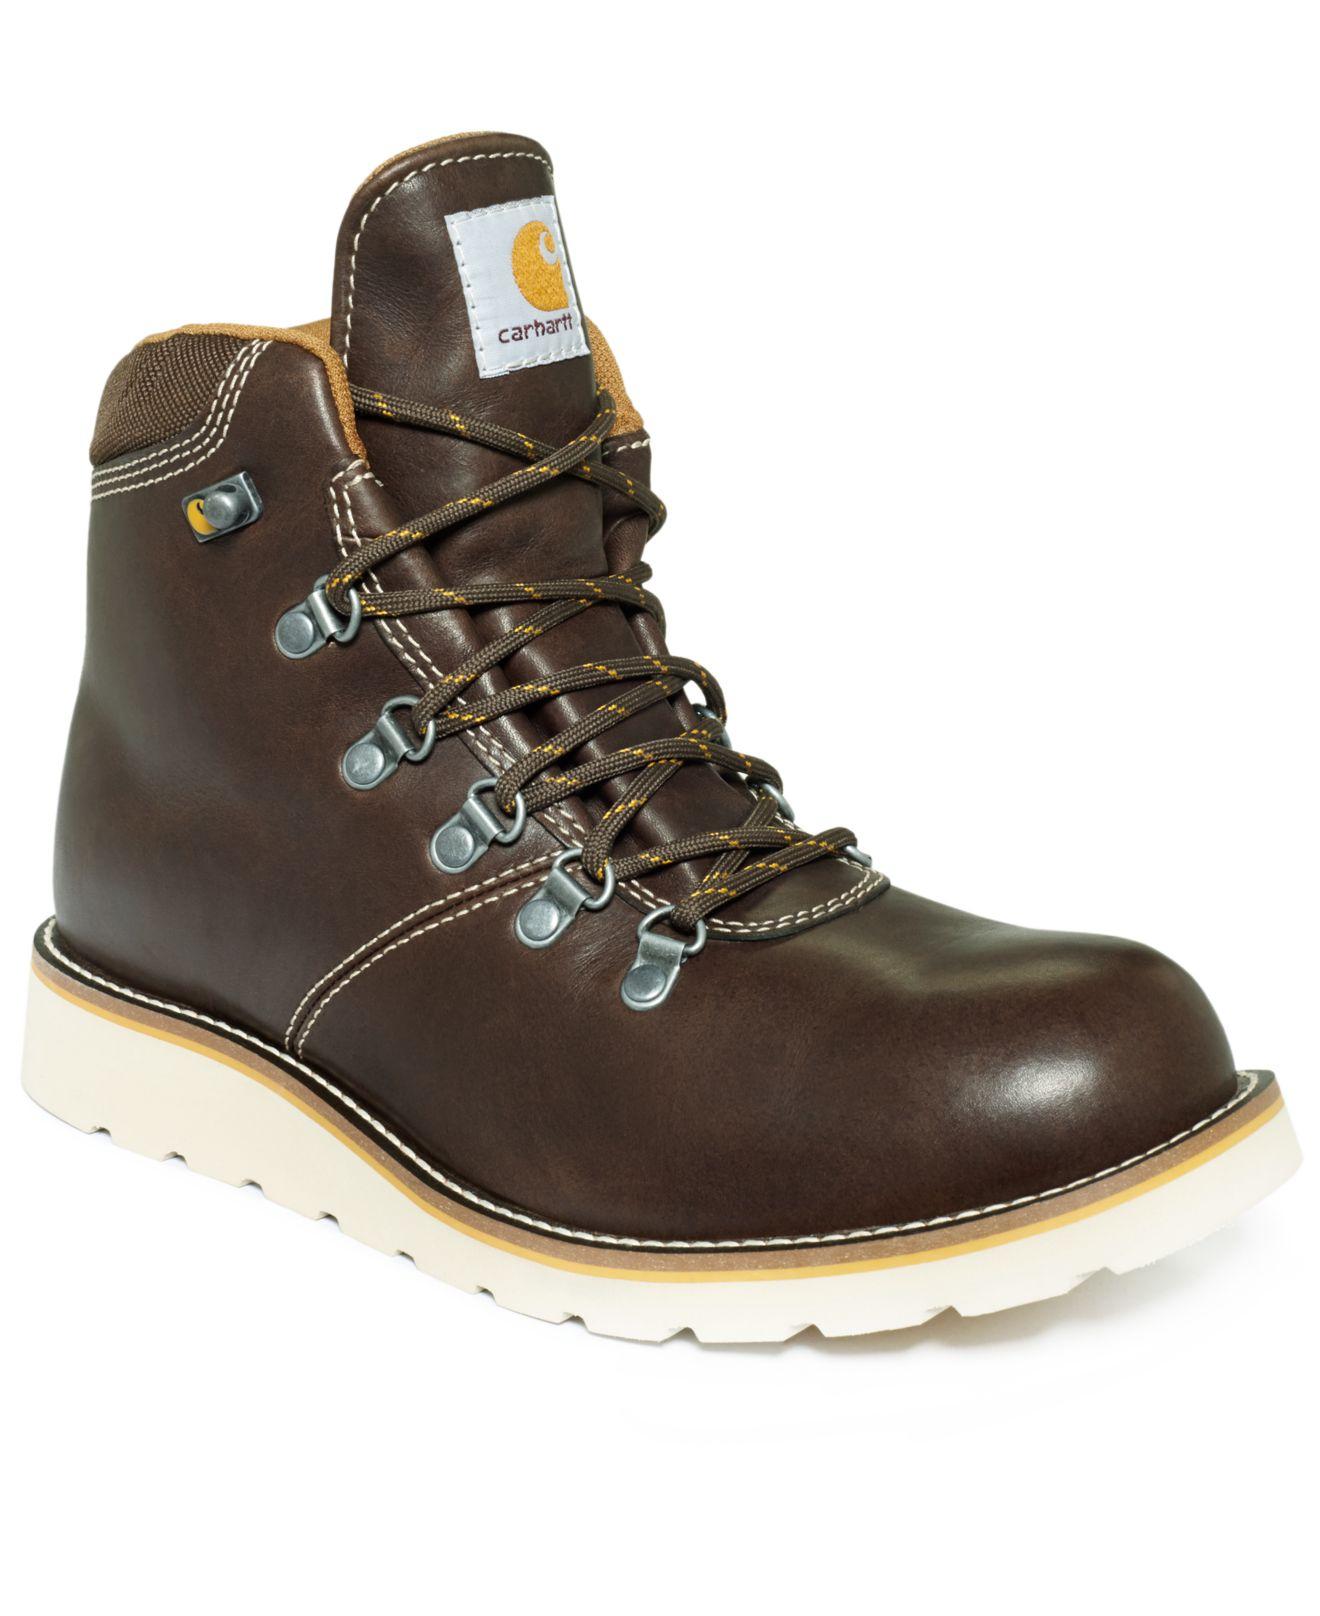 Carhartt Plain Toe 6 Inch Waterproof Wedge Boots In Brown